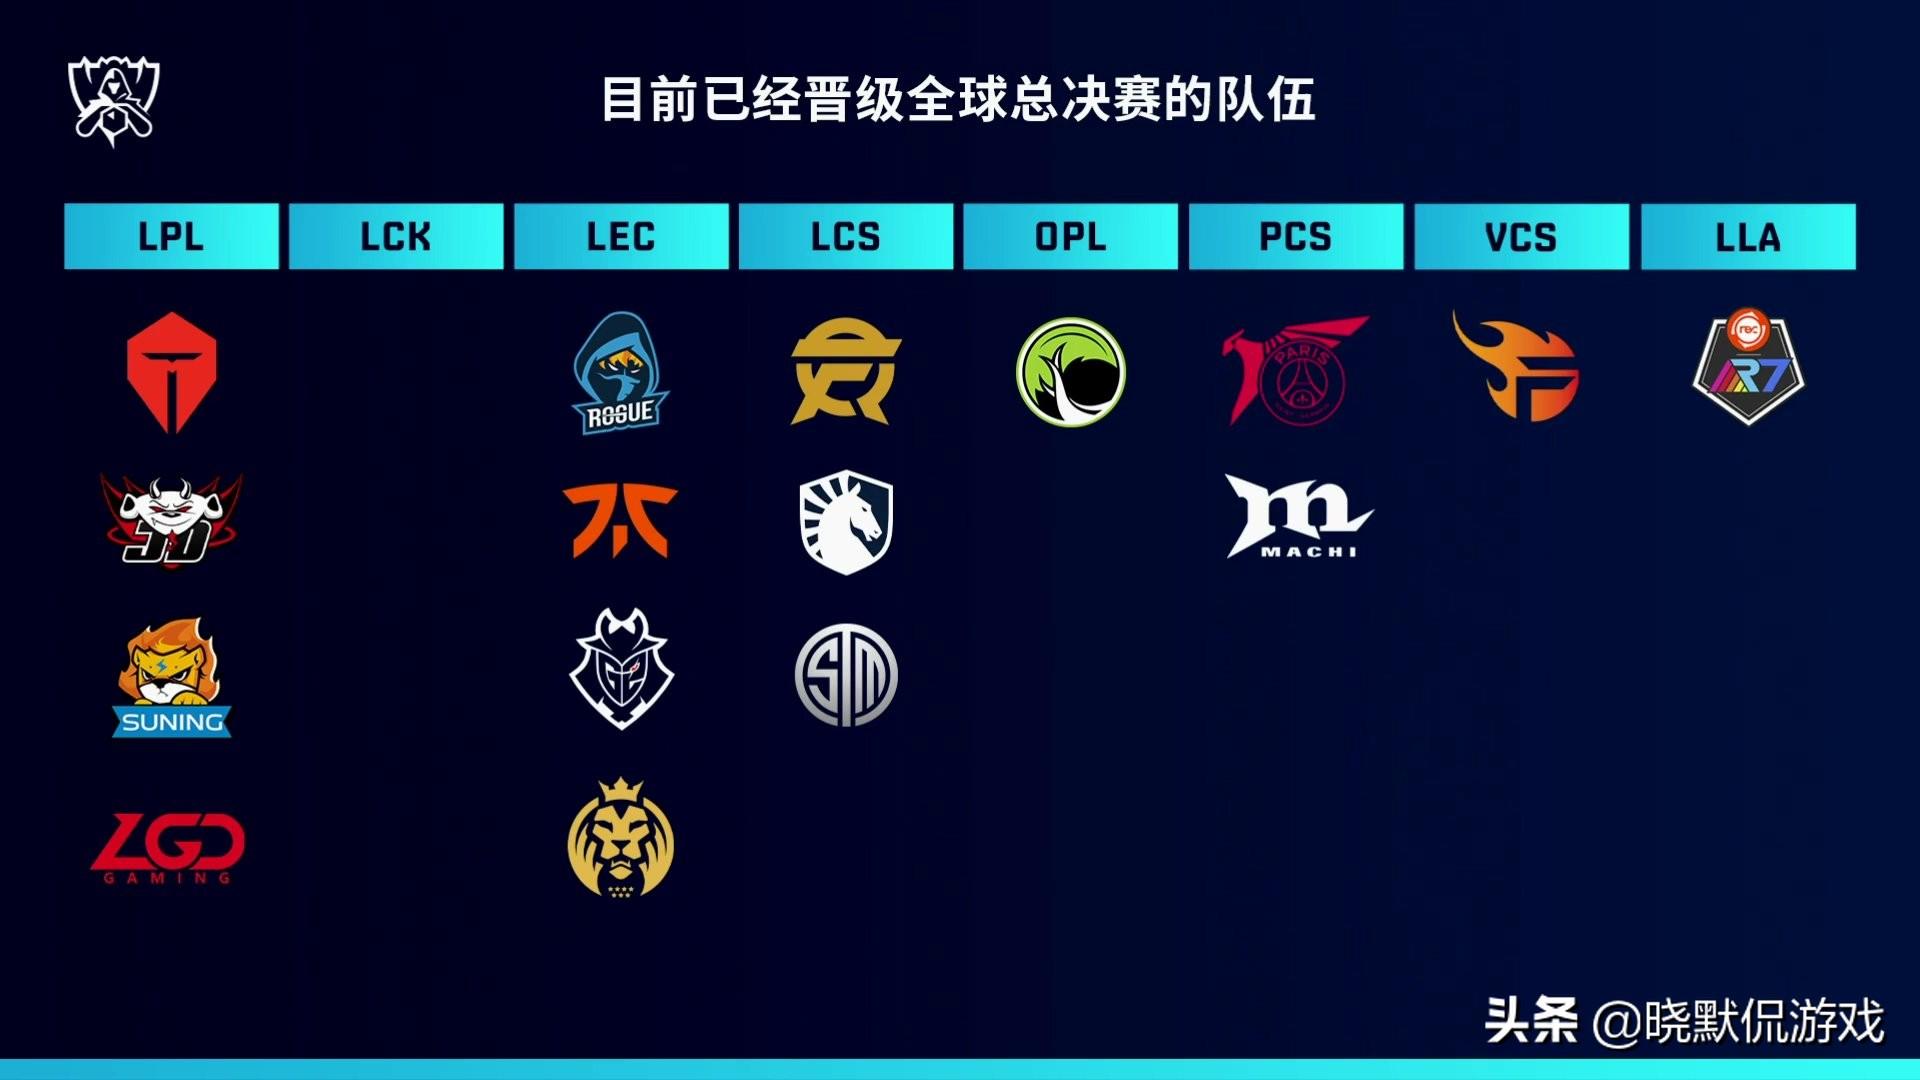 LOL总决赛参赛队出炉,LPL萌新,其他赛区都是老队,怎么打